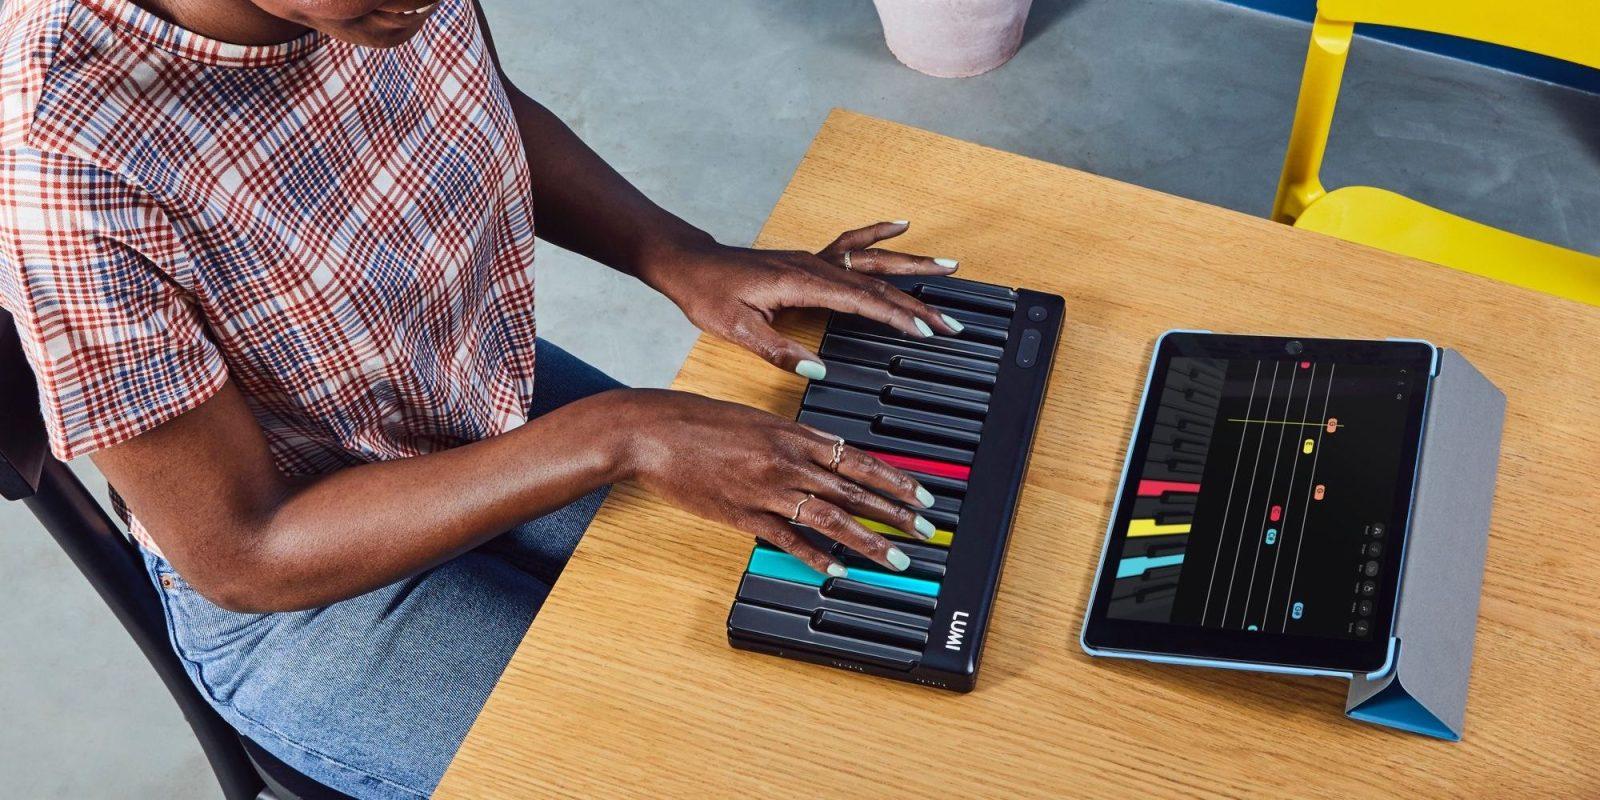 ROLI's intros Lumi keyboard w/ multi-colored LED keys and iOS app integration